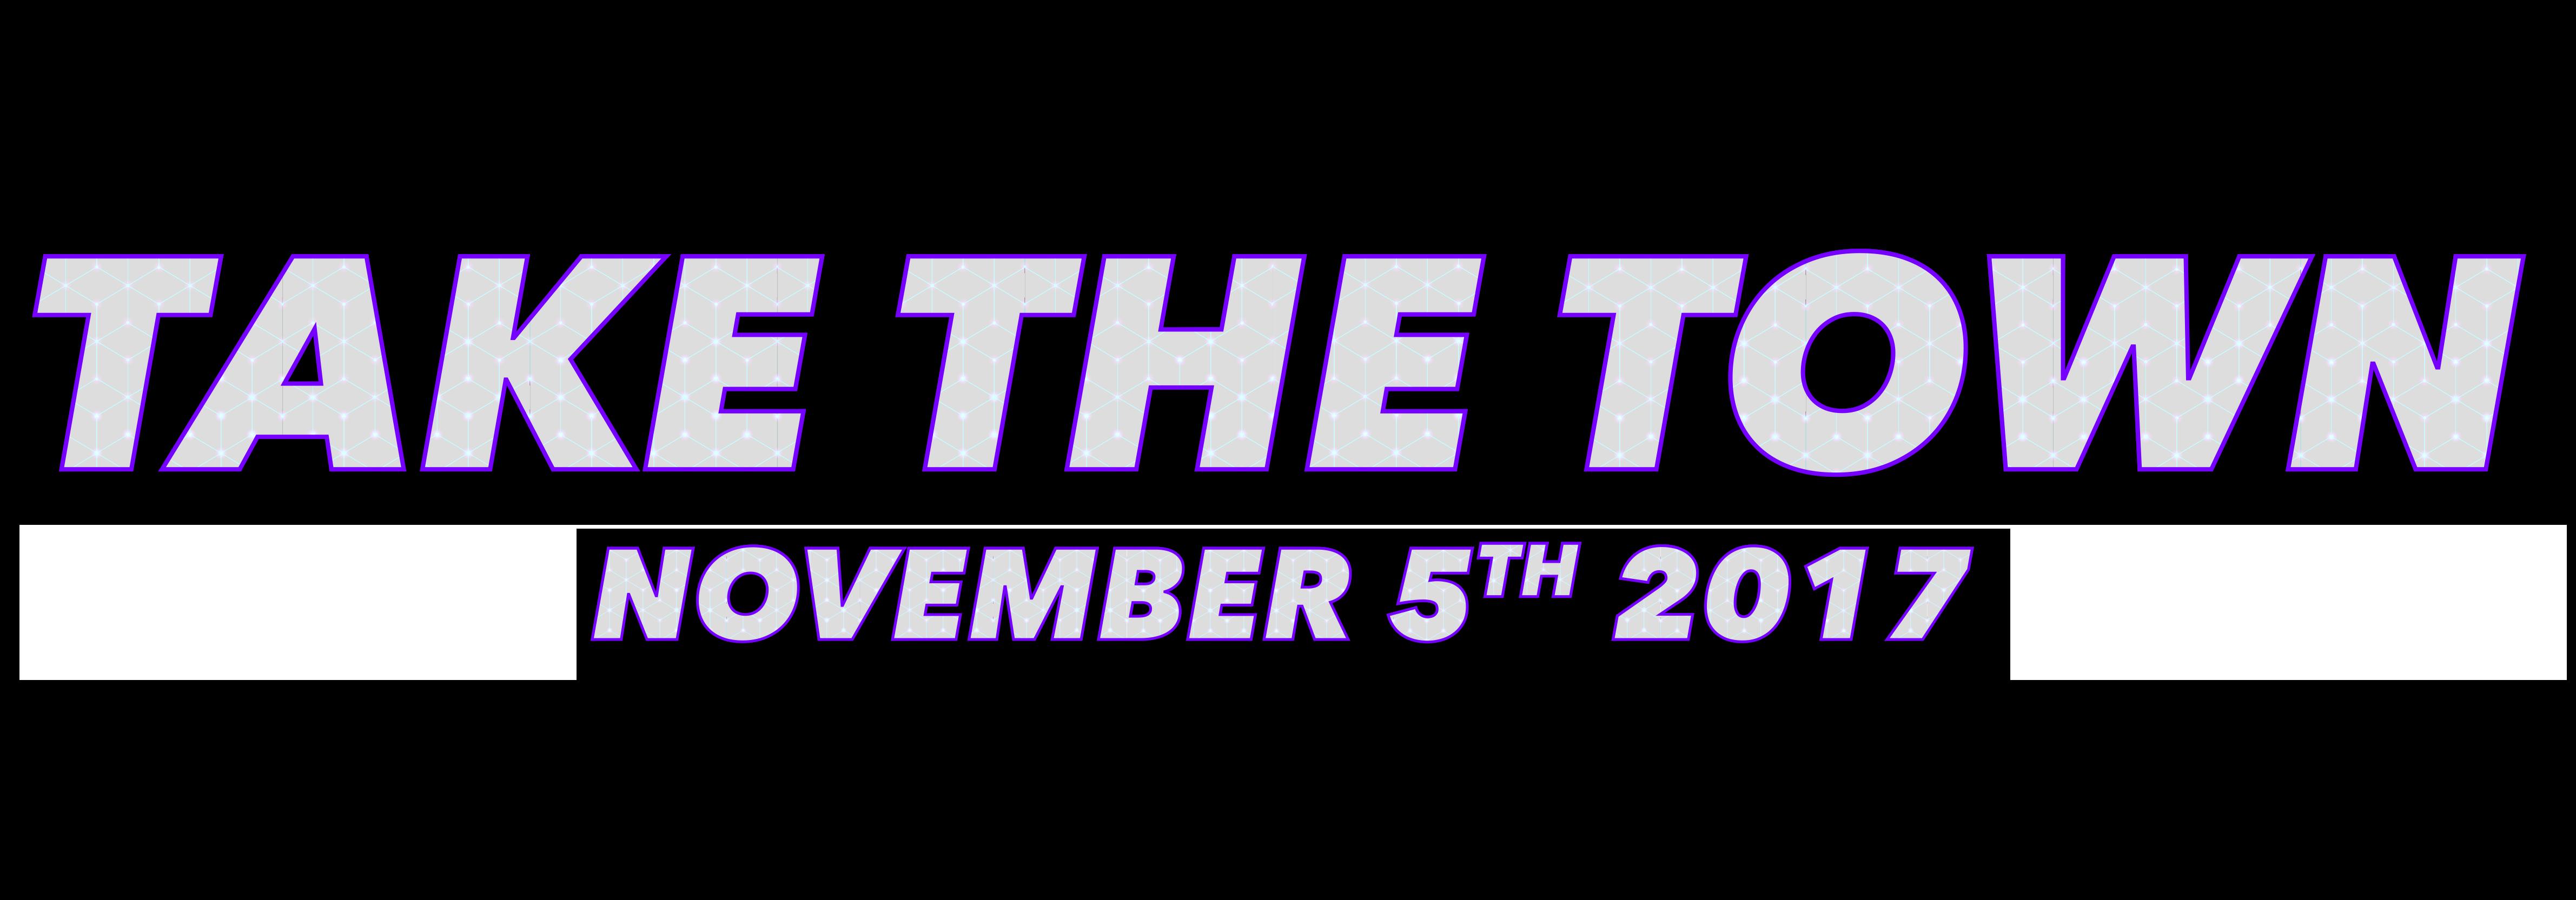 Take The Town 2017